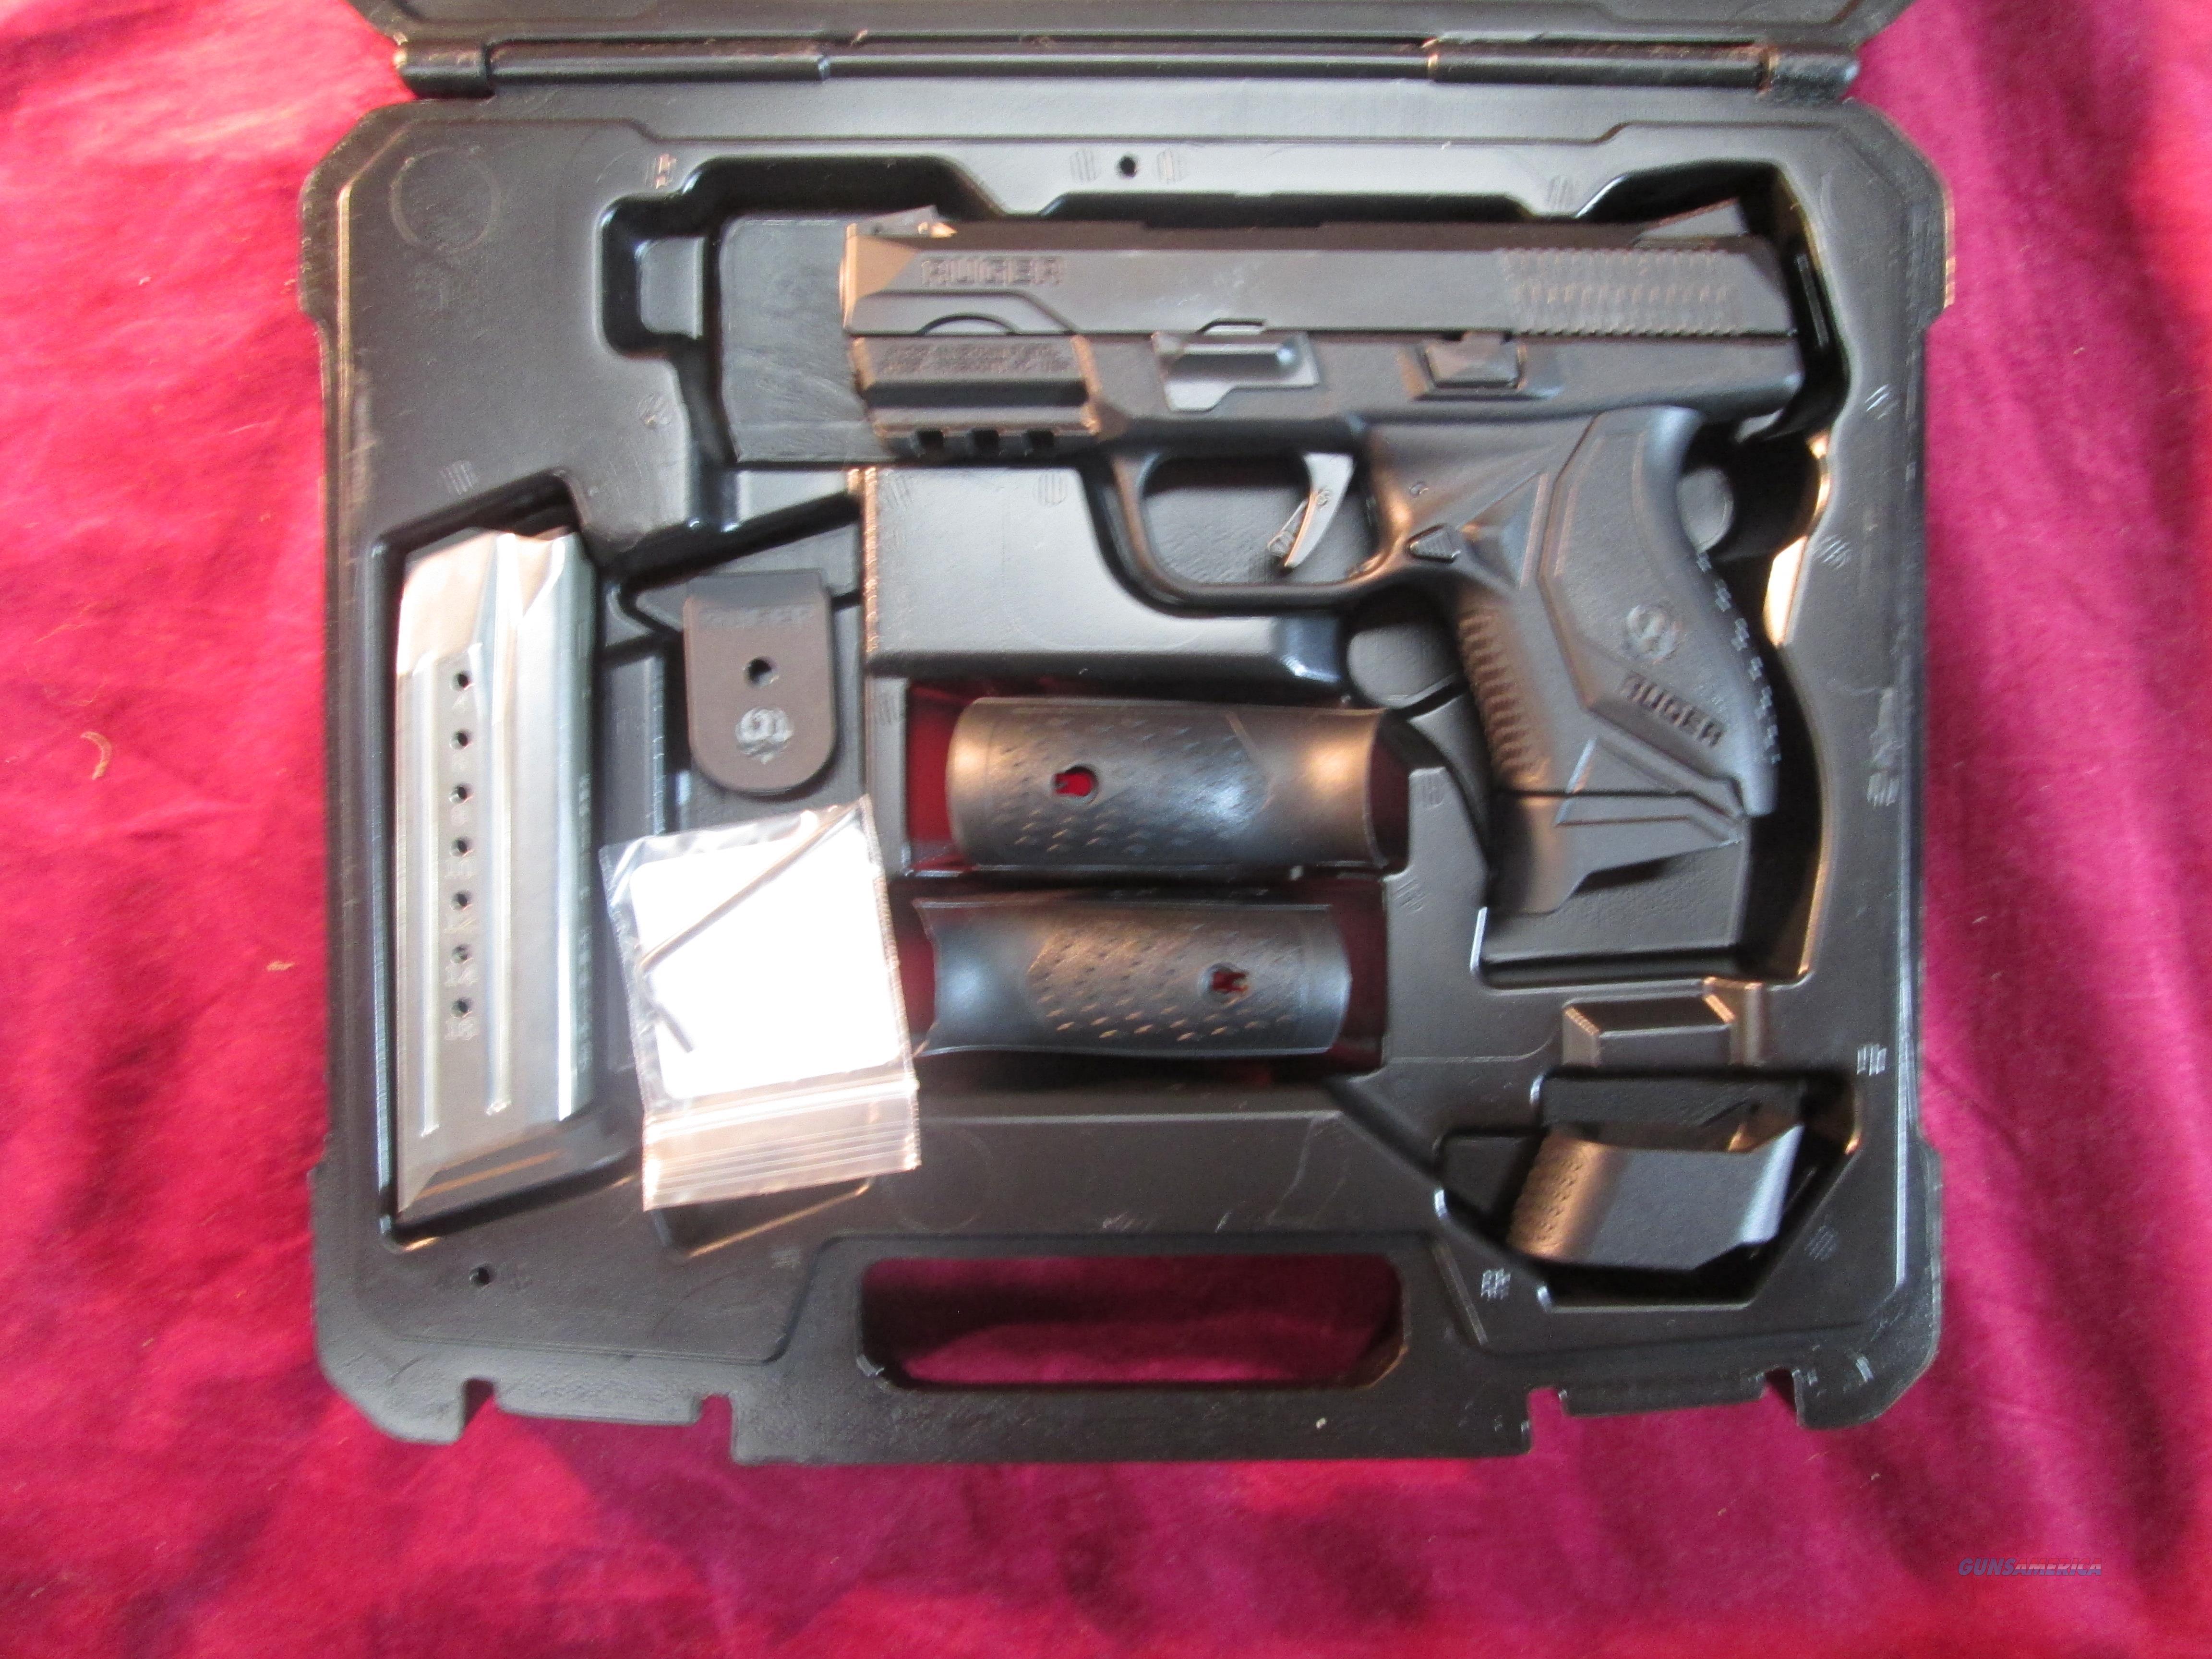 RUGER AMERICAN COMPACT PISTOL 9MM BLACK NITRIDE NEW (08635)   Guns > Pistols > Ruger Semi-Auto Pistols > American Pistols